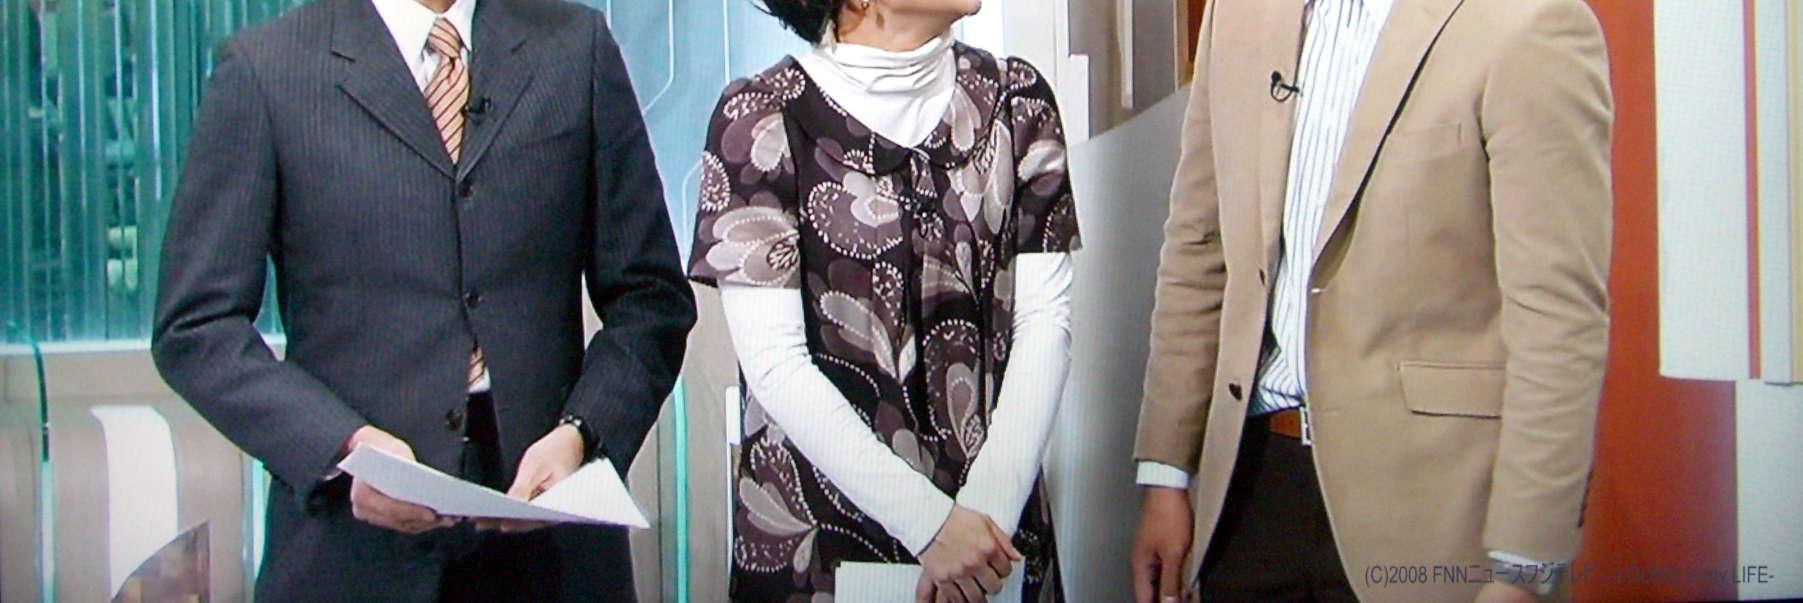 LOUNIE(ルーニィ)2008冬植物柄ワンピース(FNNニュース2)